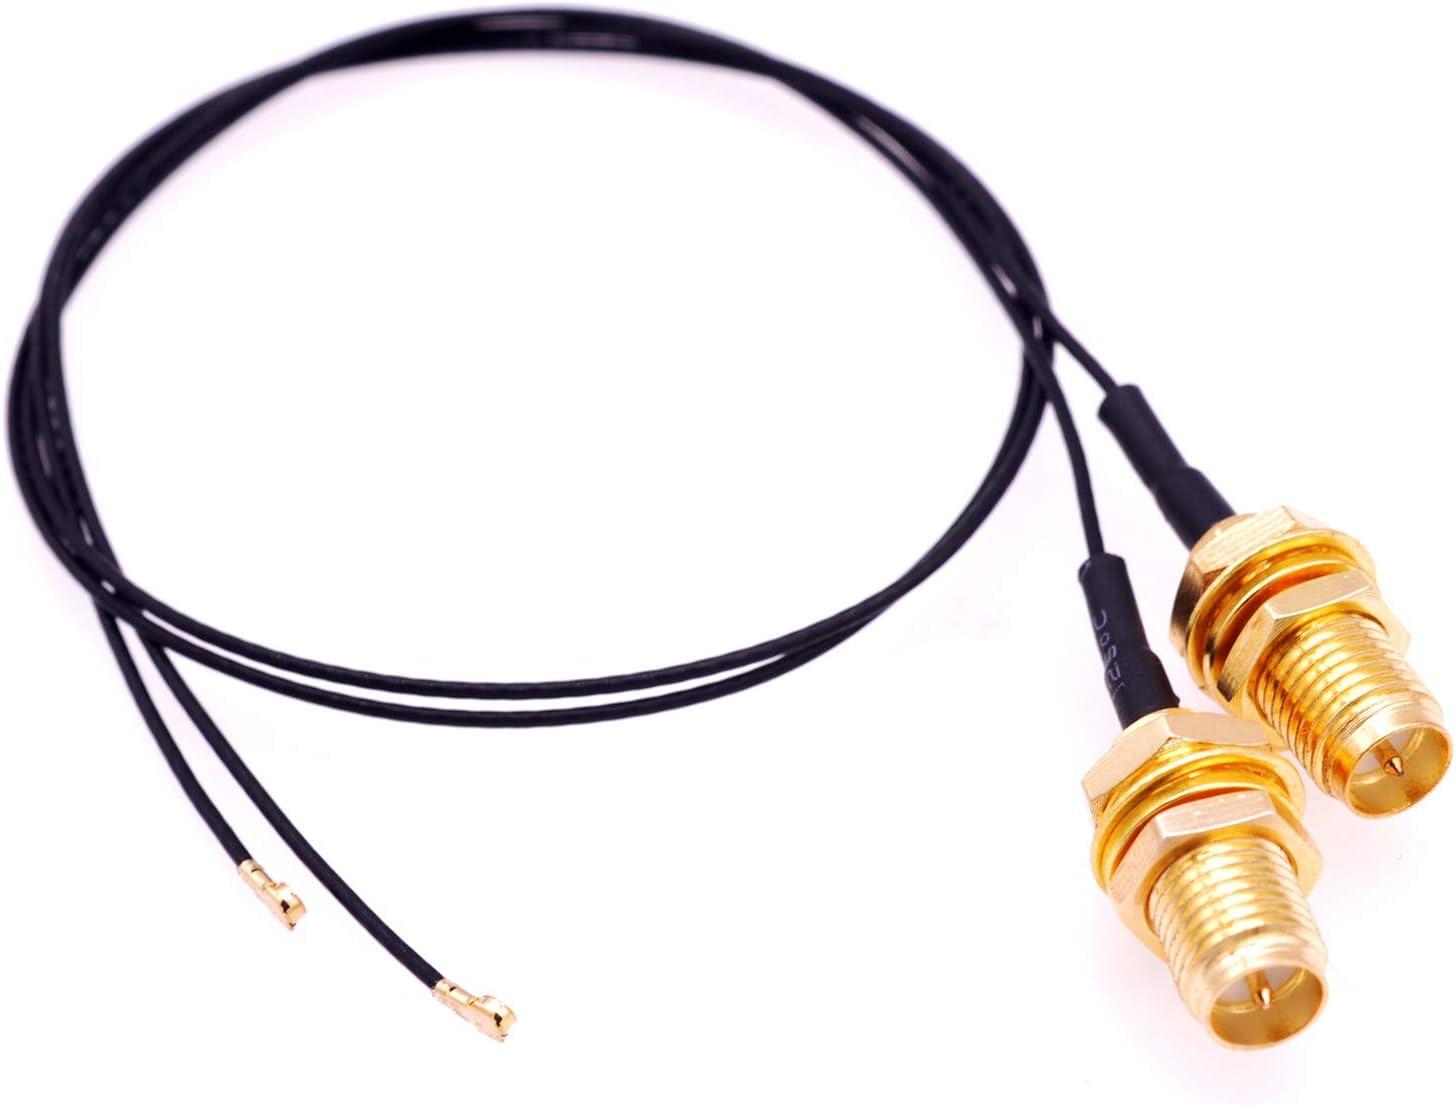 Deal4GO - Conector de Antena Hembra IPEX4 MHF4 de 30 cm para M2 NGFF WLAN Card AX200NGW 9560 9260 8265 8260 7265 7260